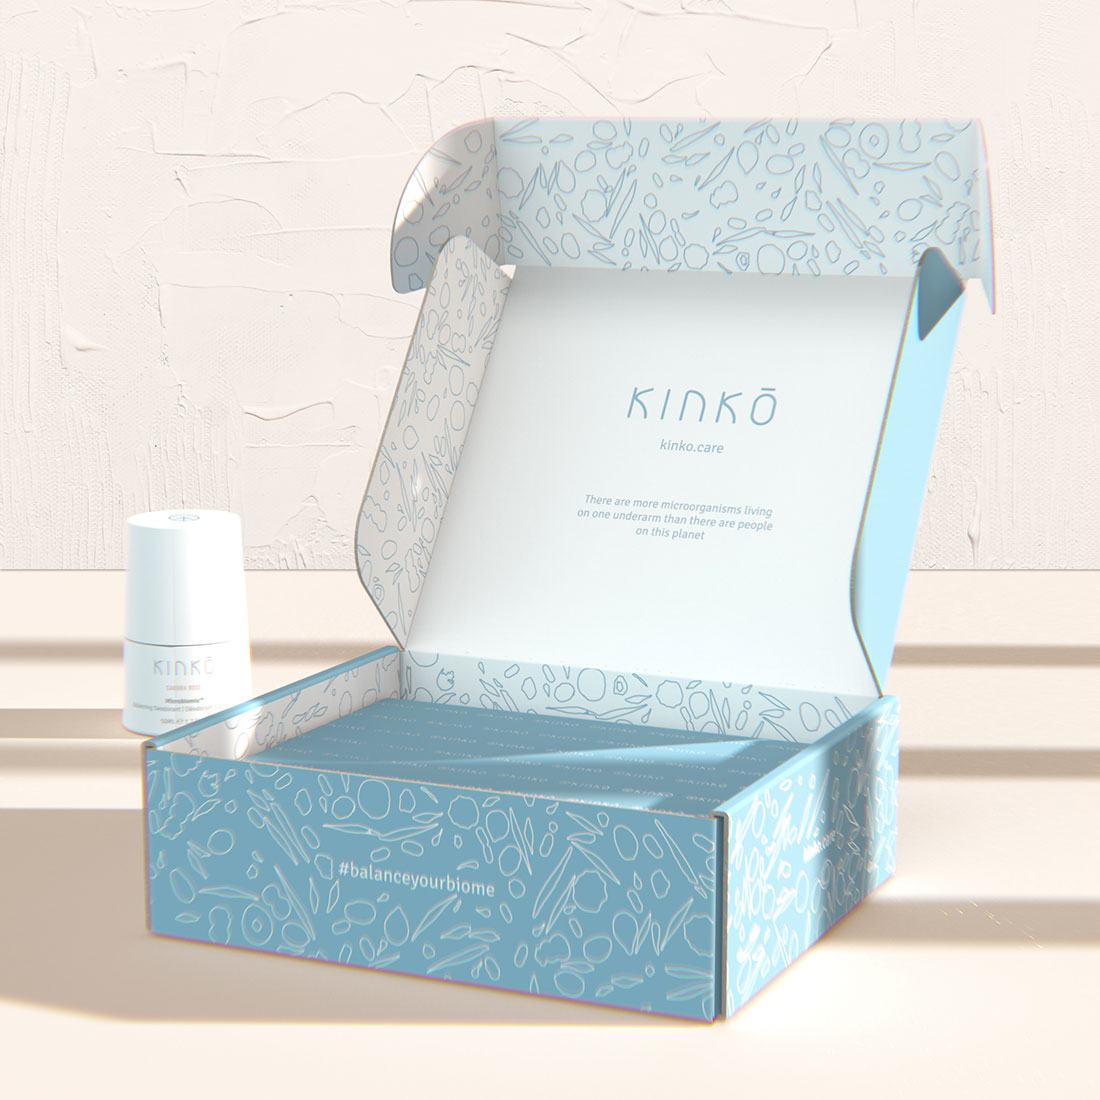 matiz barcelona kinko deodorant mailing box CGI